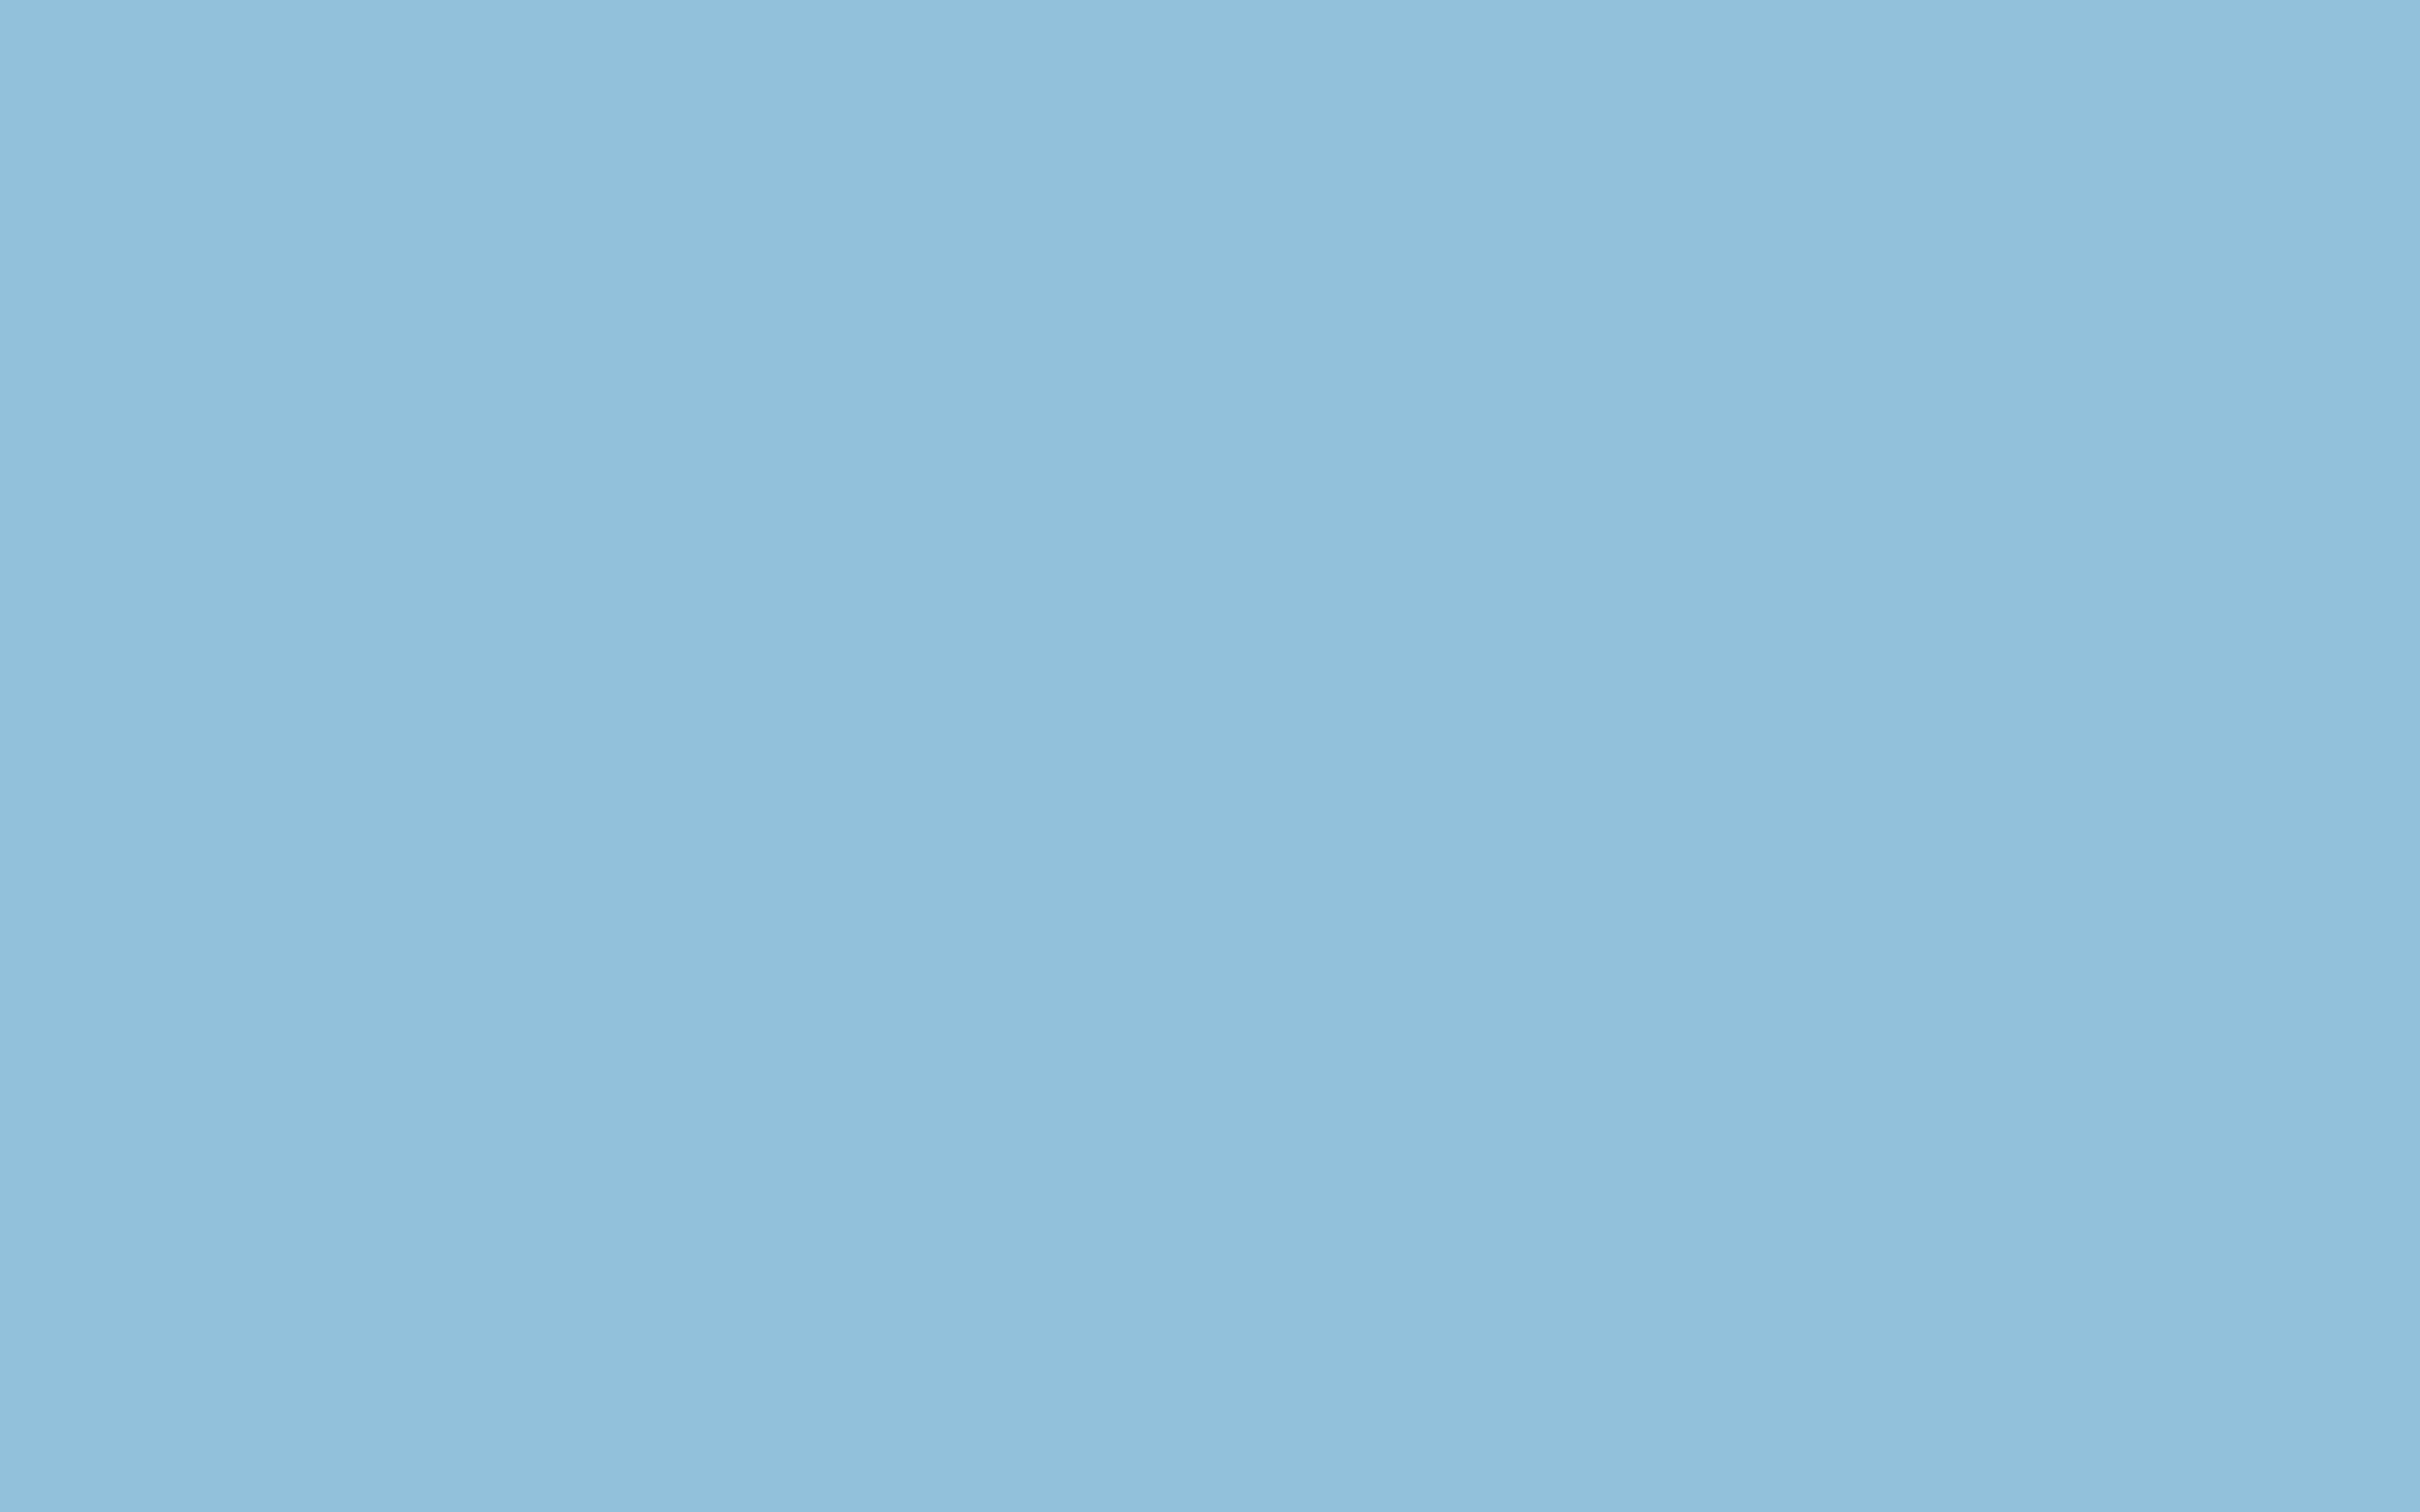 hinh nen mau xanh 74